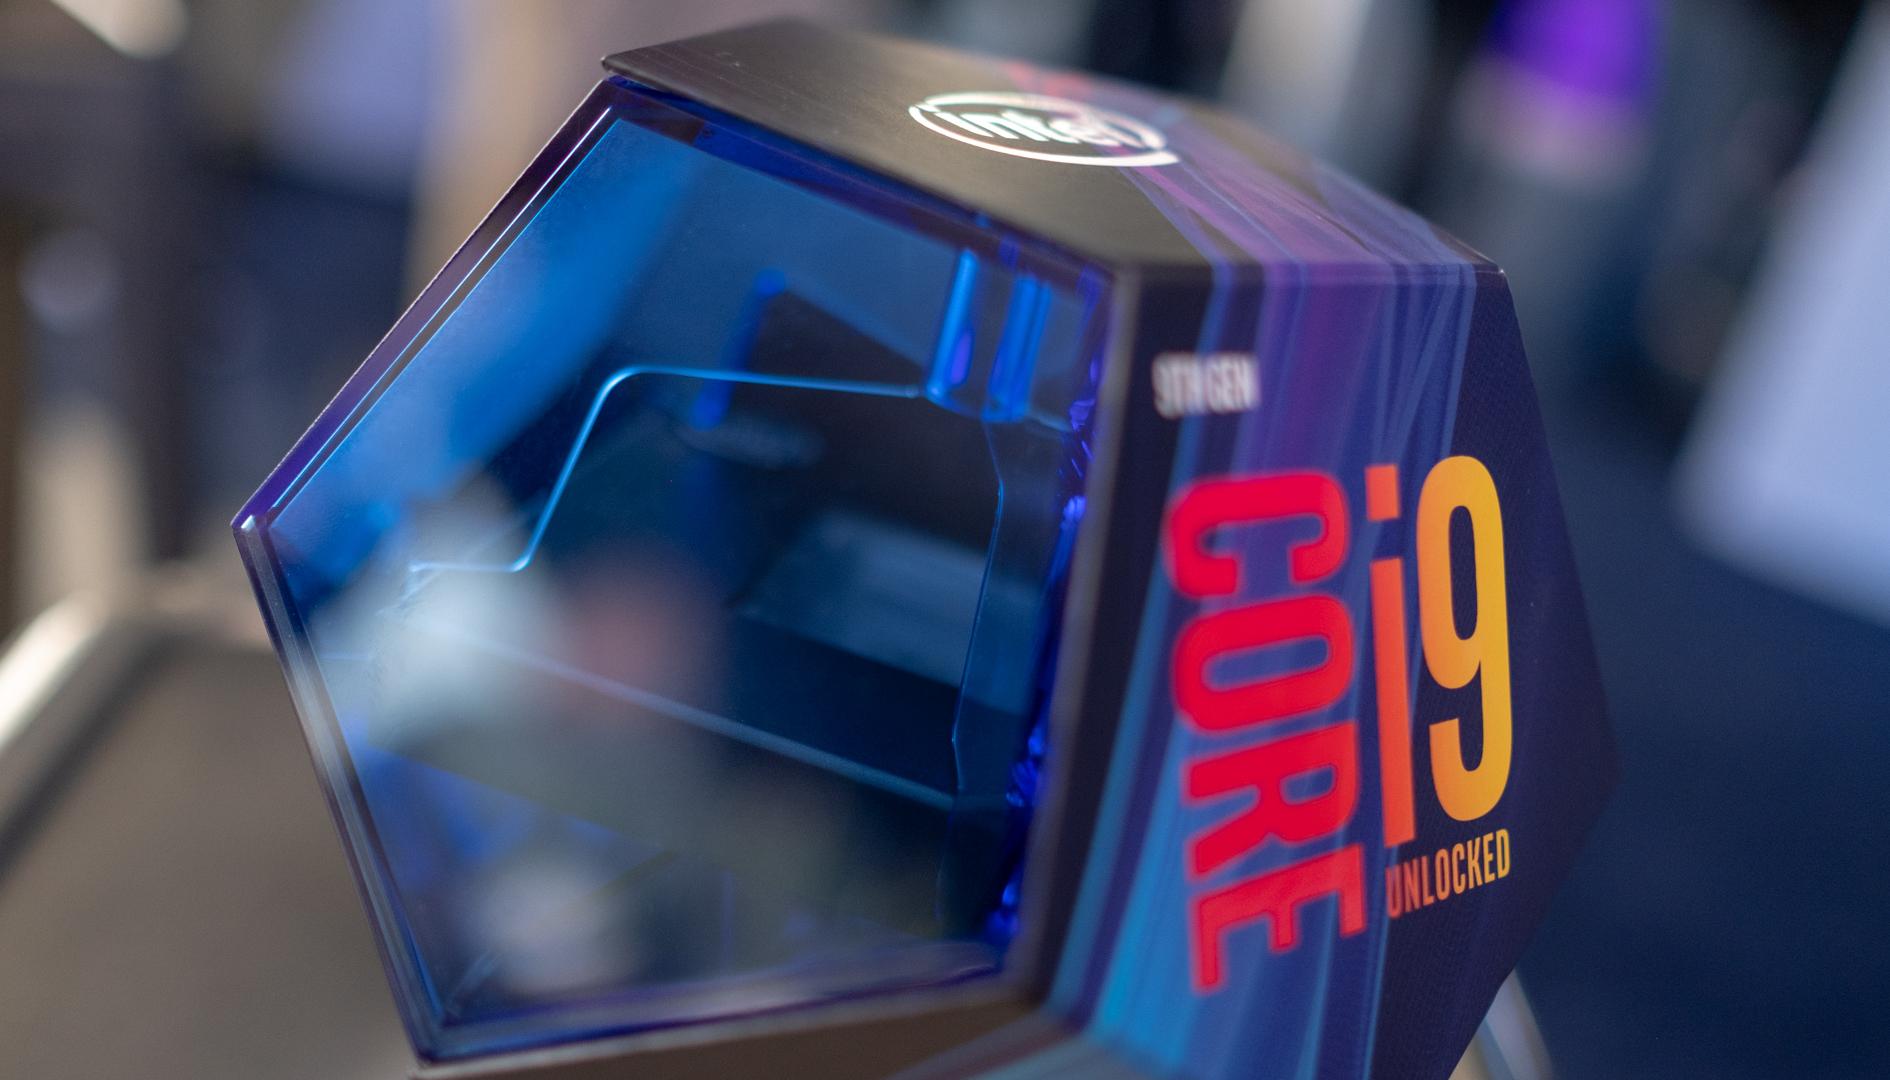 Intel Core i9-10900K, spunta una misteriosa variante